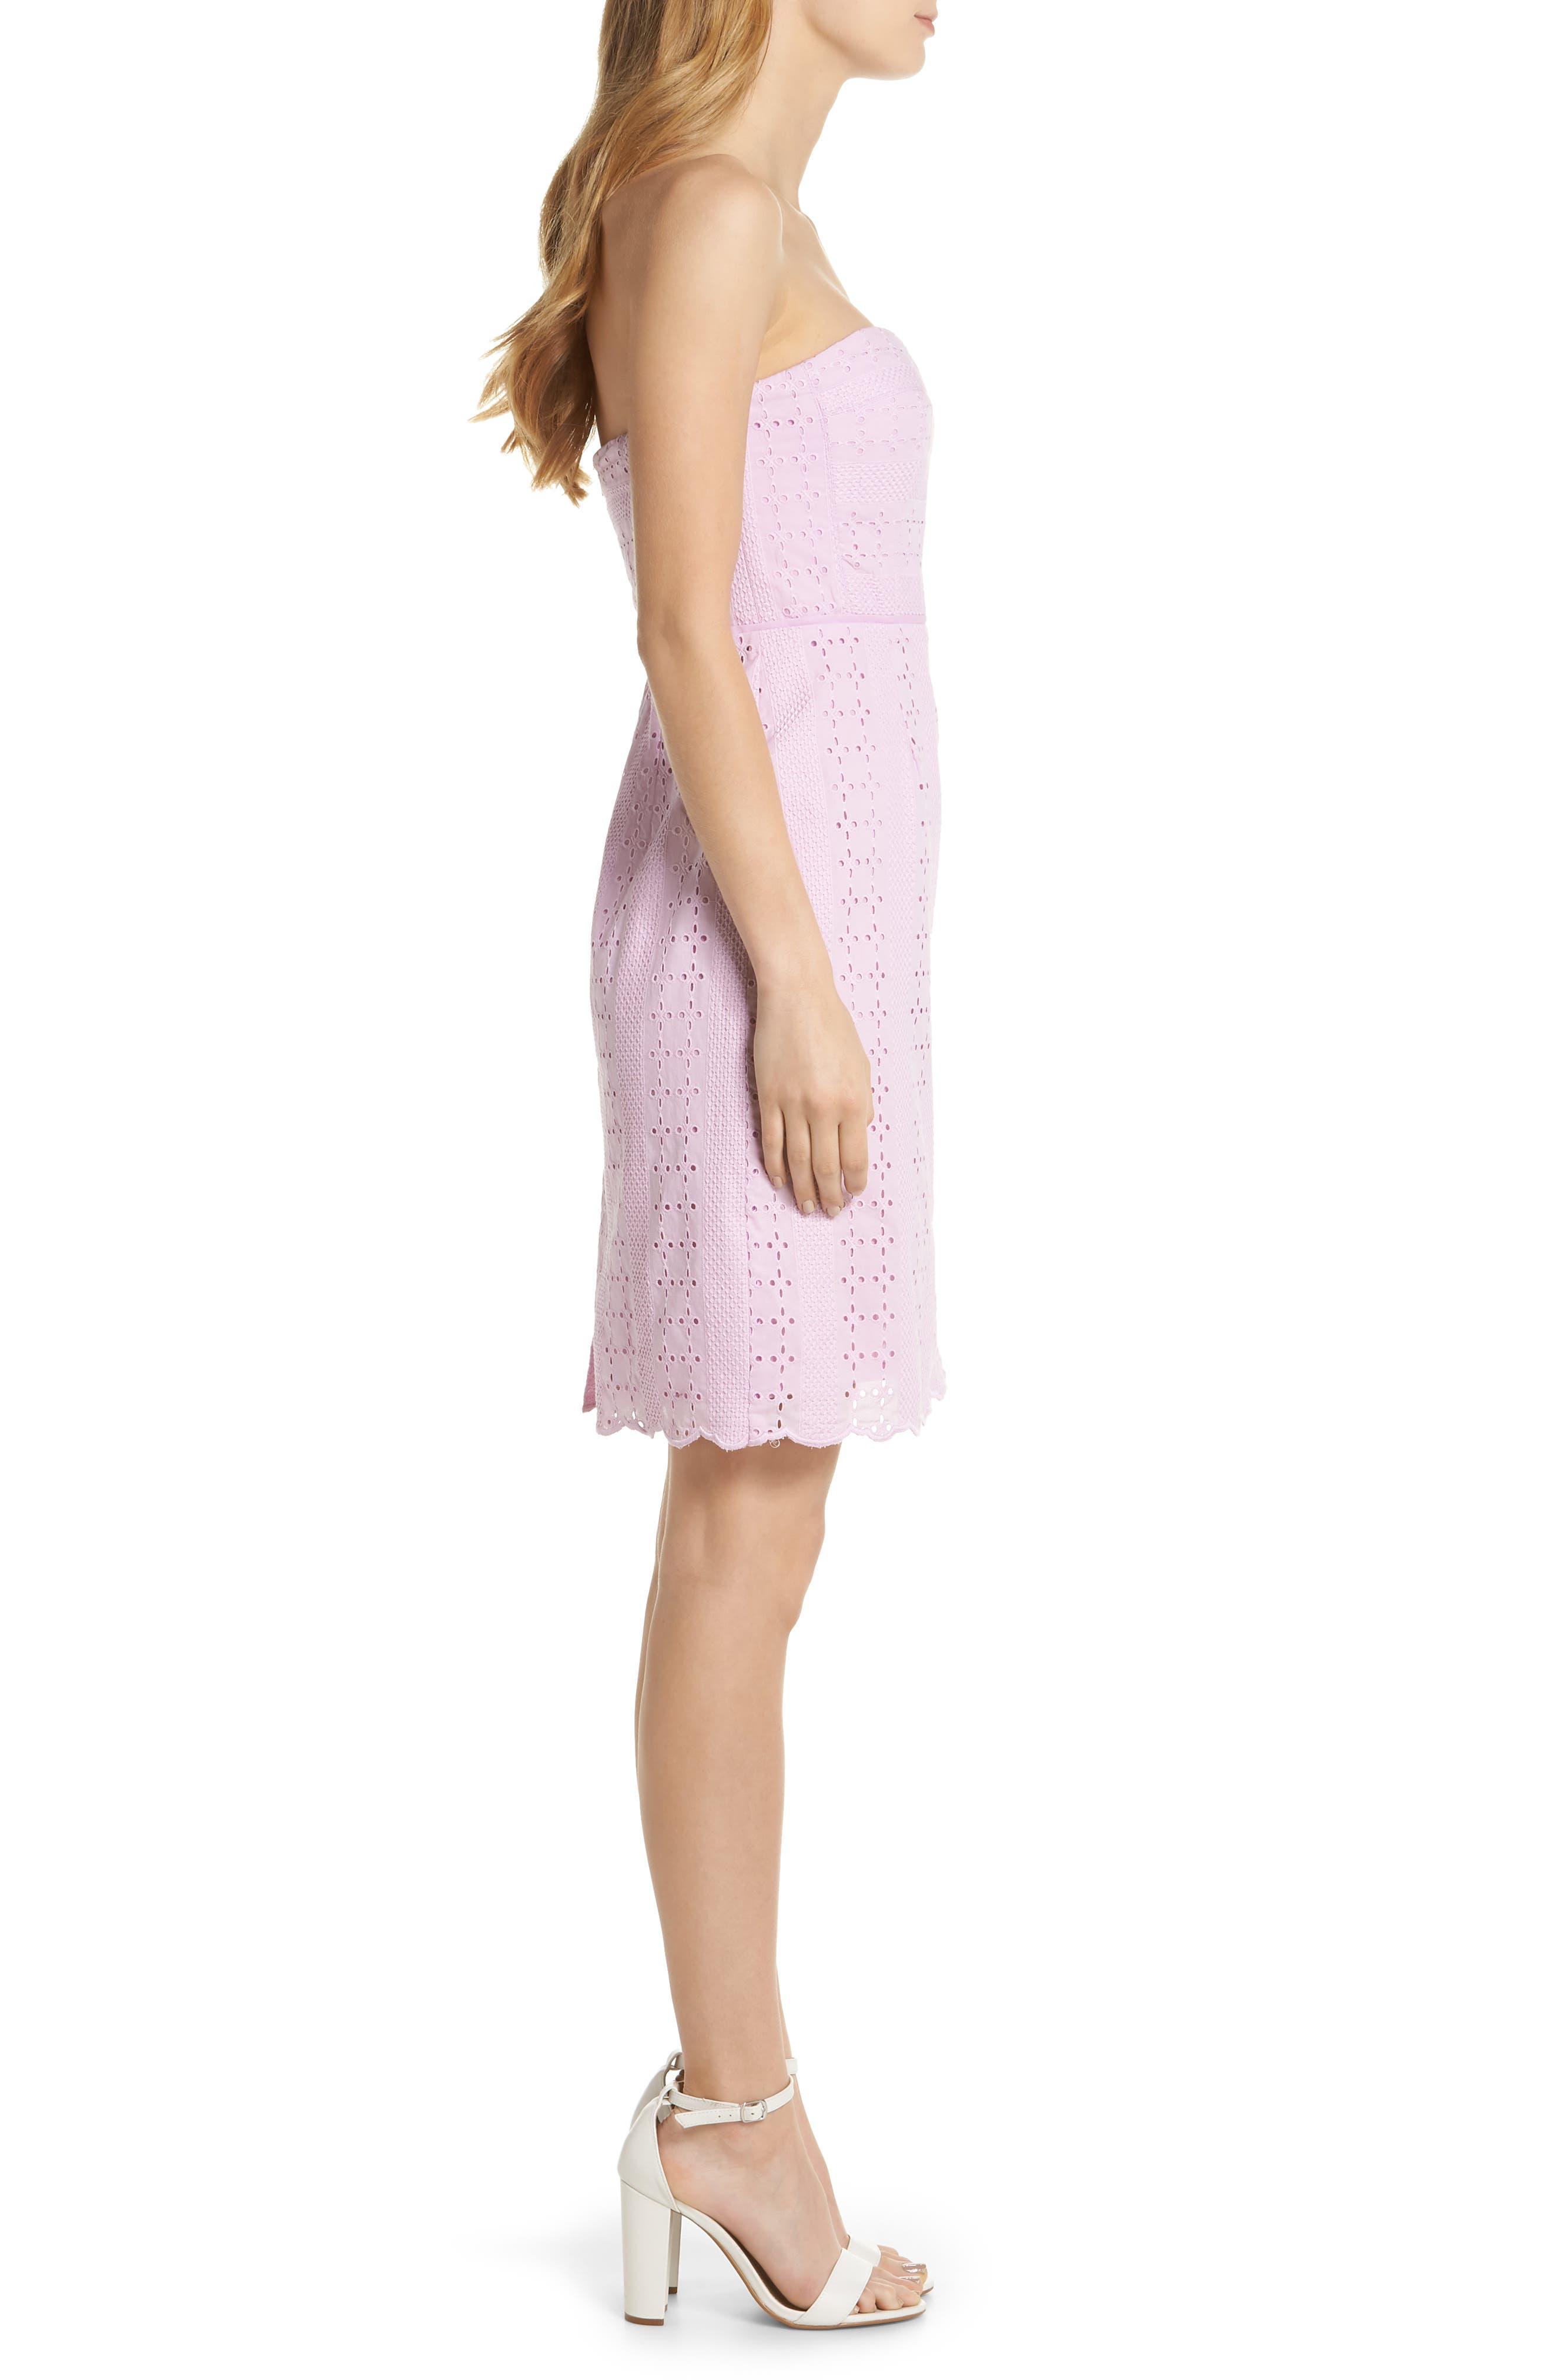 J.Crew Strapless Eyelet Sheath Dress,                             Alternate thumbnail 3, color,                             Lavender Mist